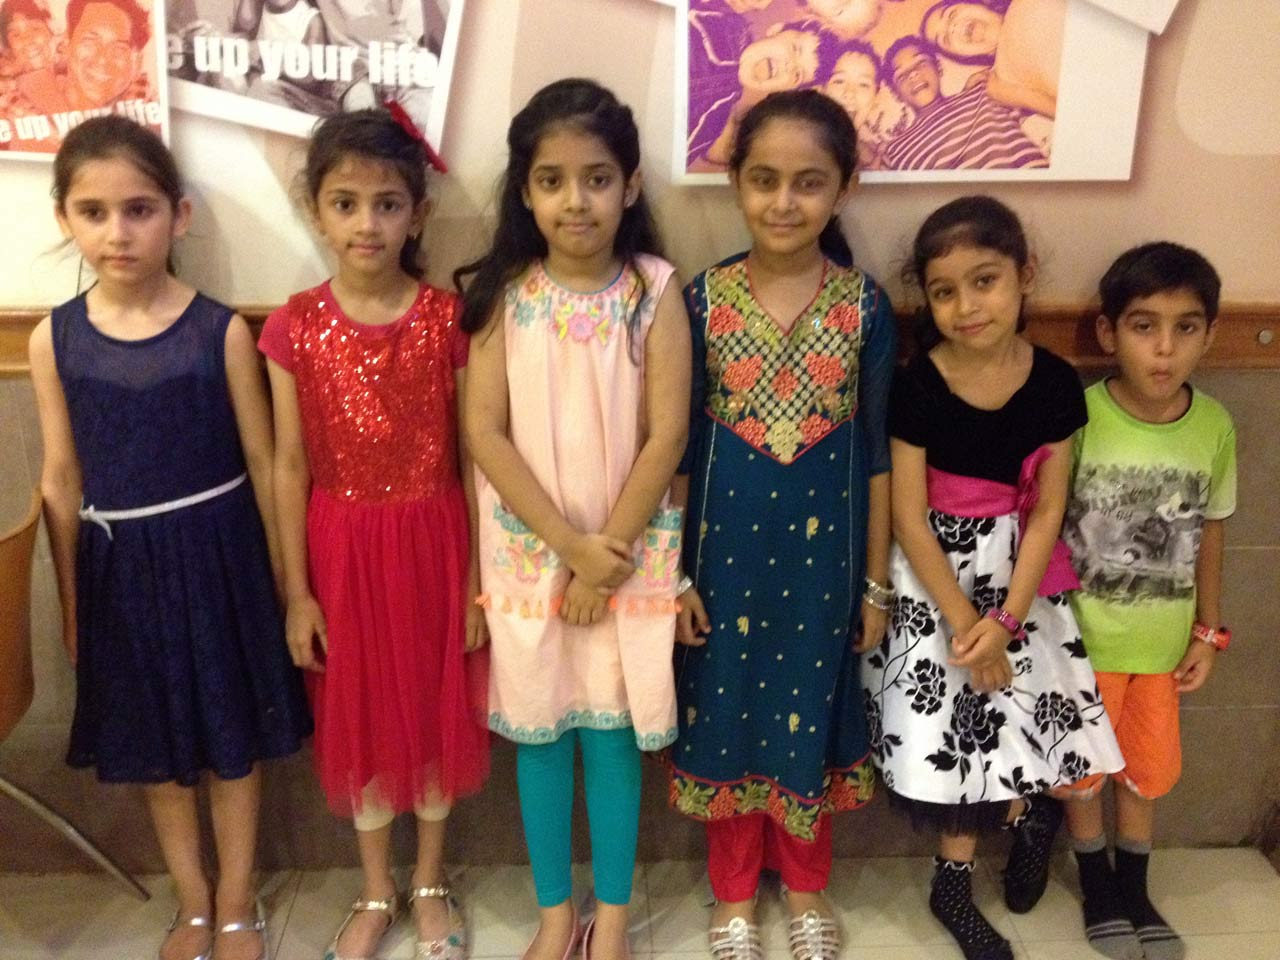 Zara Imran with her friends, Areesha Naseem, Maidah Amir, Khadija Faizan, Fatima Tahir, Furqan Tahir